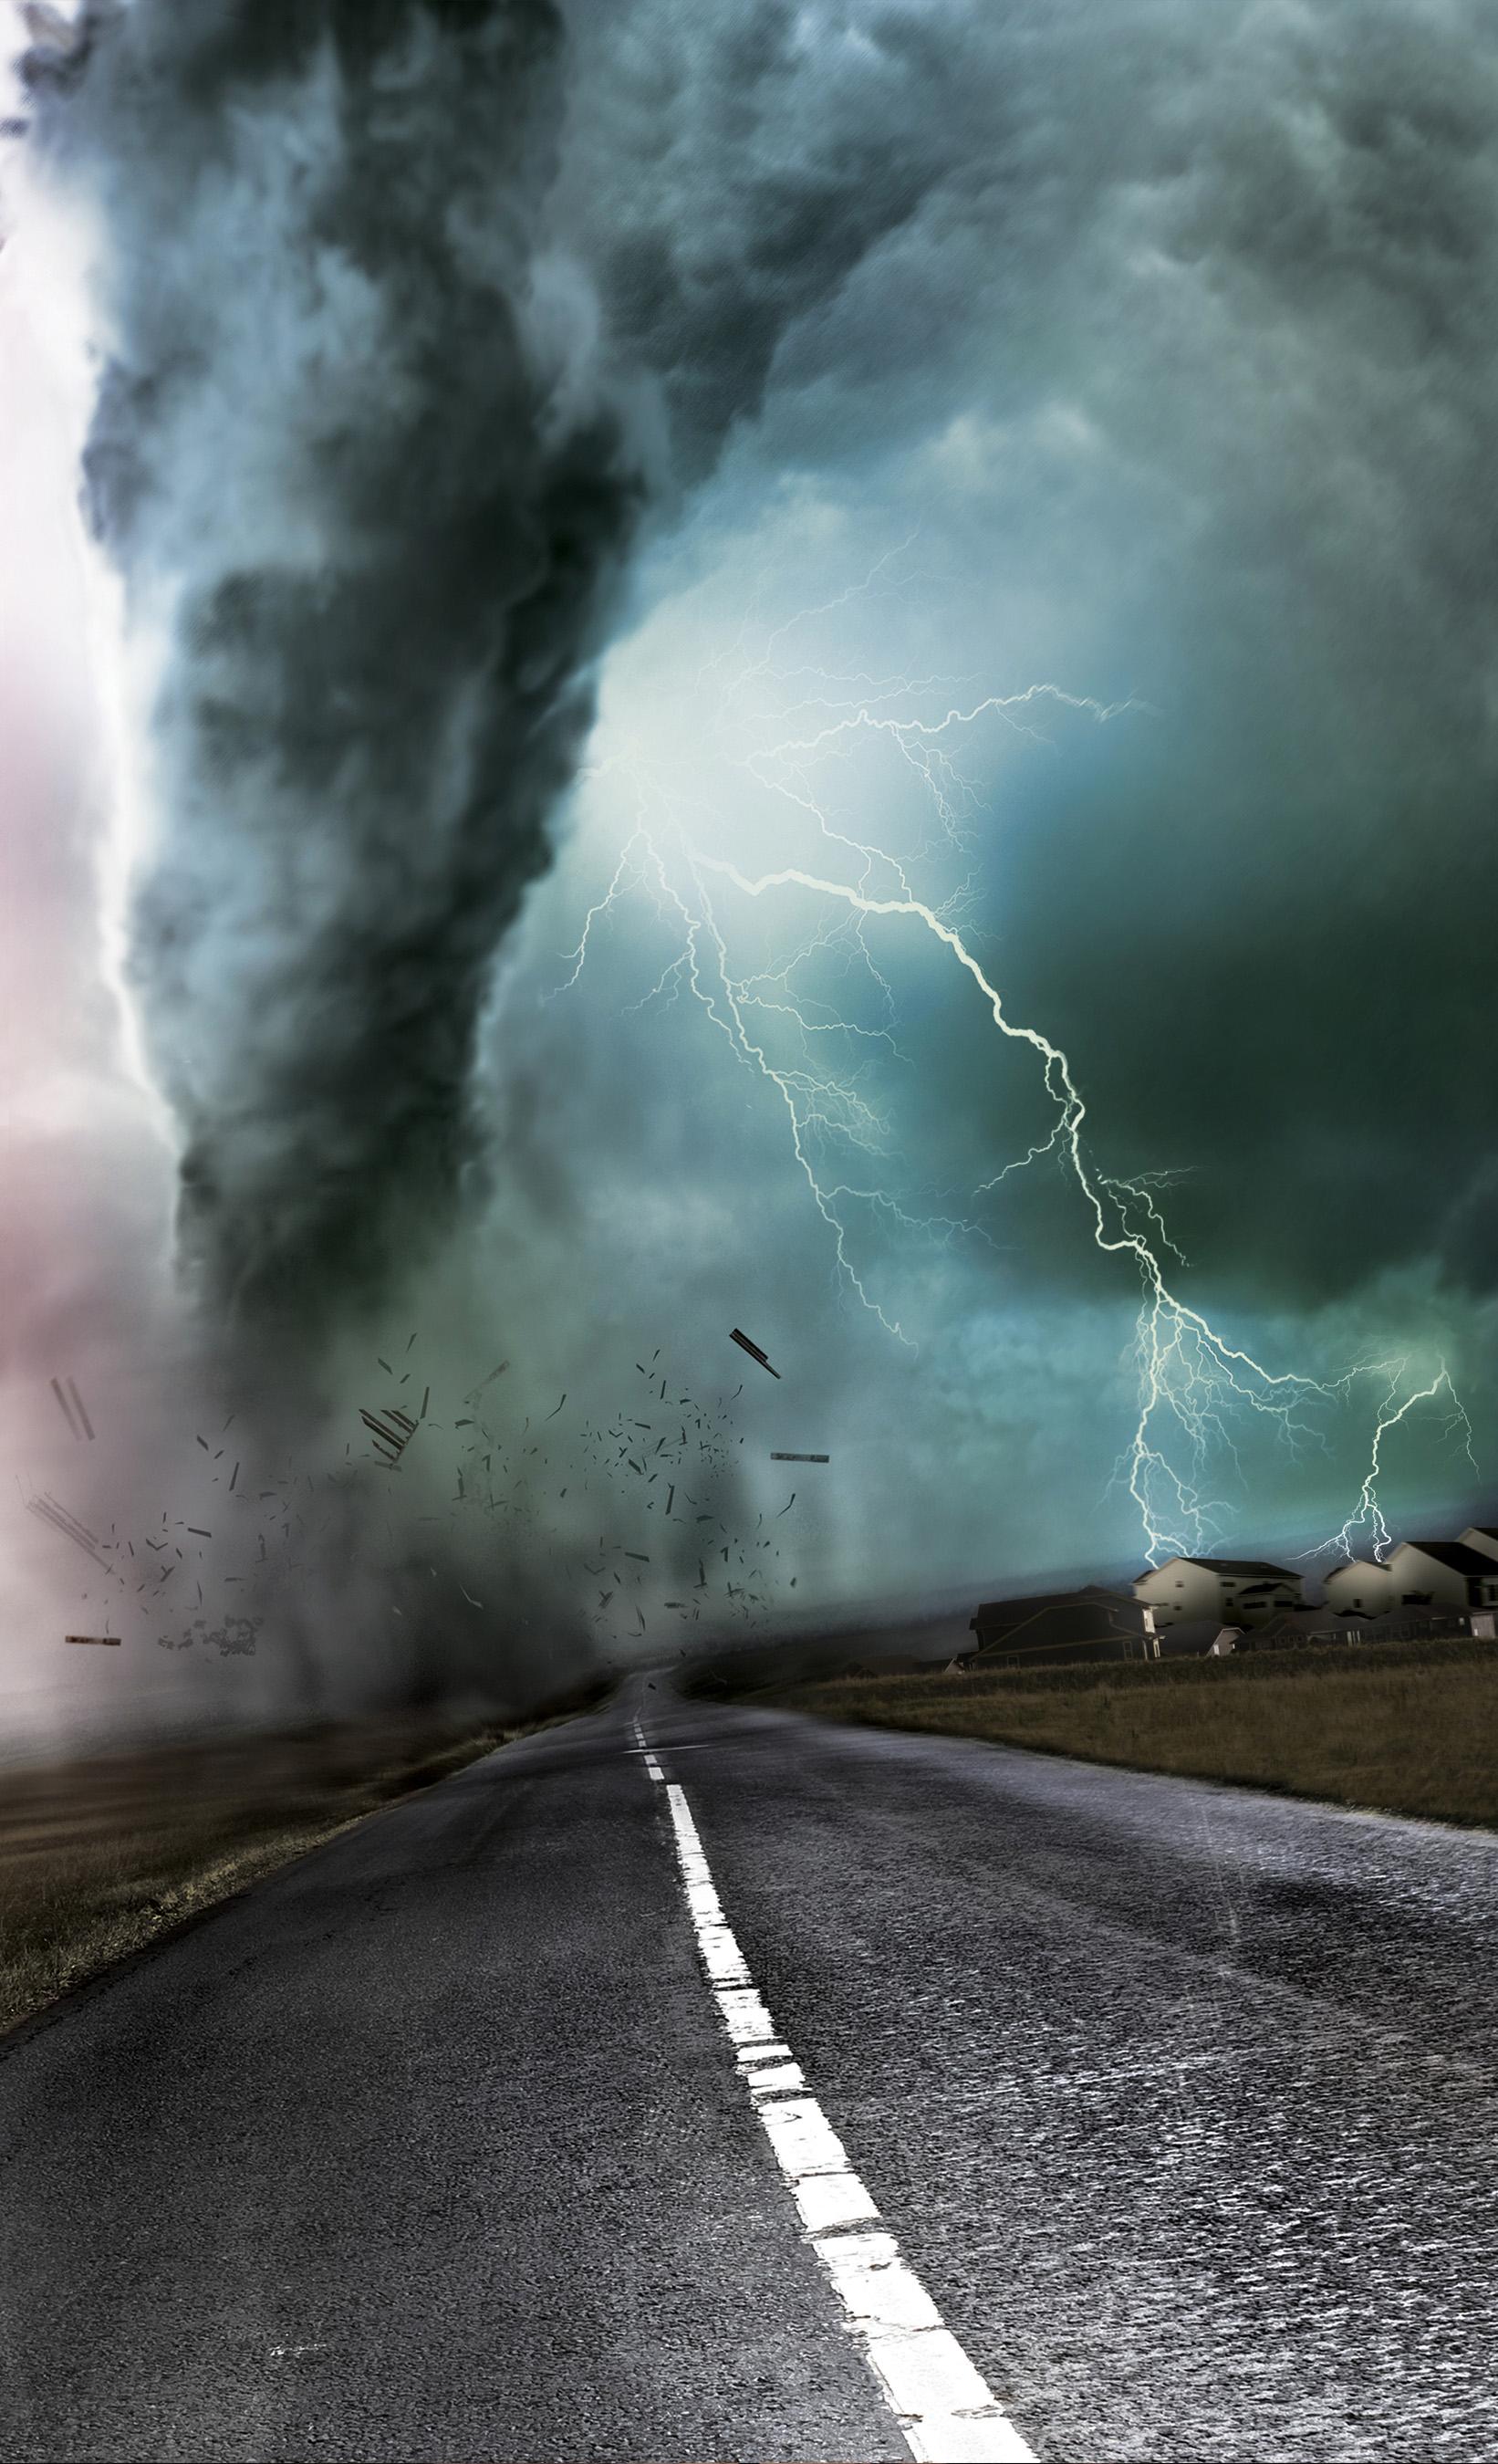 America's PrepareAthon and Tornado Preparedness